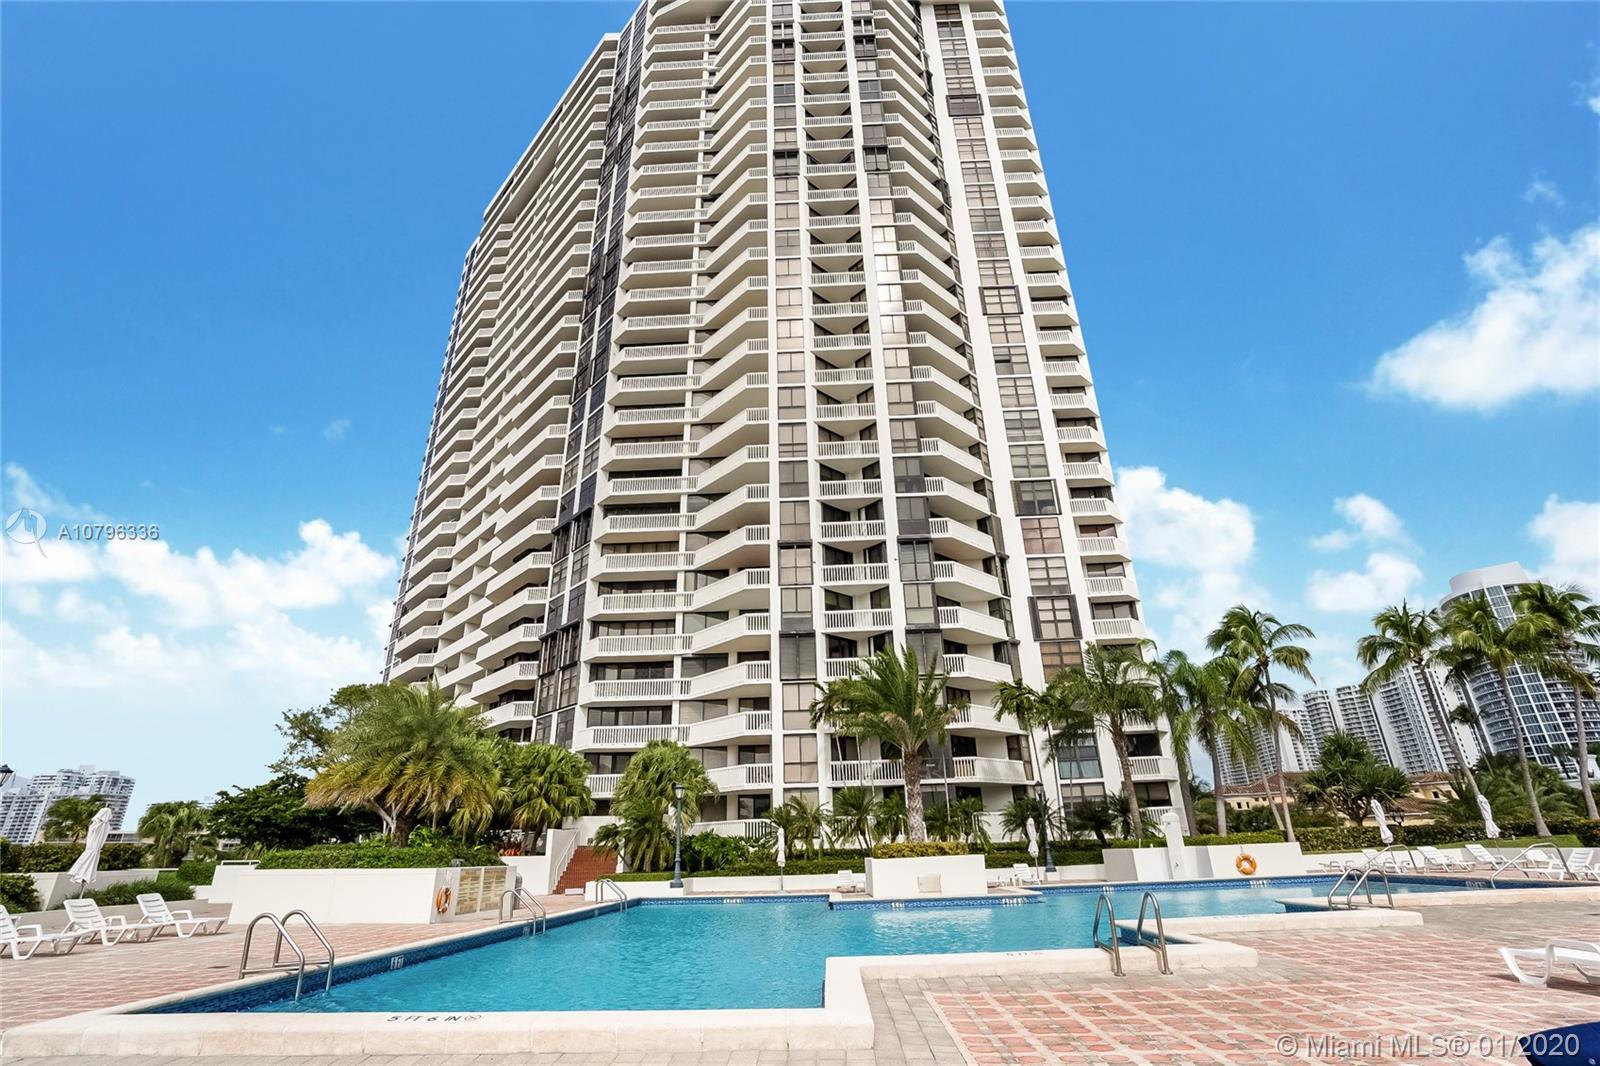 1000 W Island Blvd #2406, Aventura, FL 33160 - Aventura, FL real estate listing